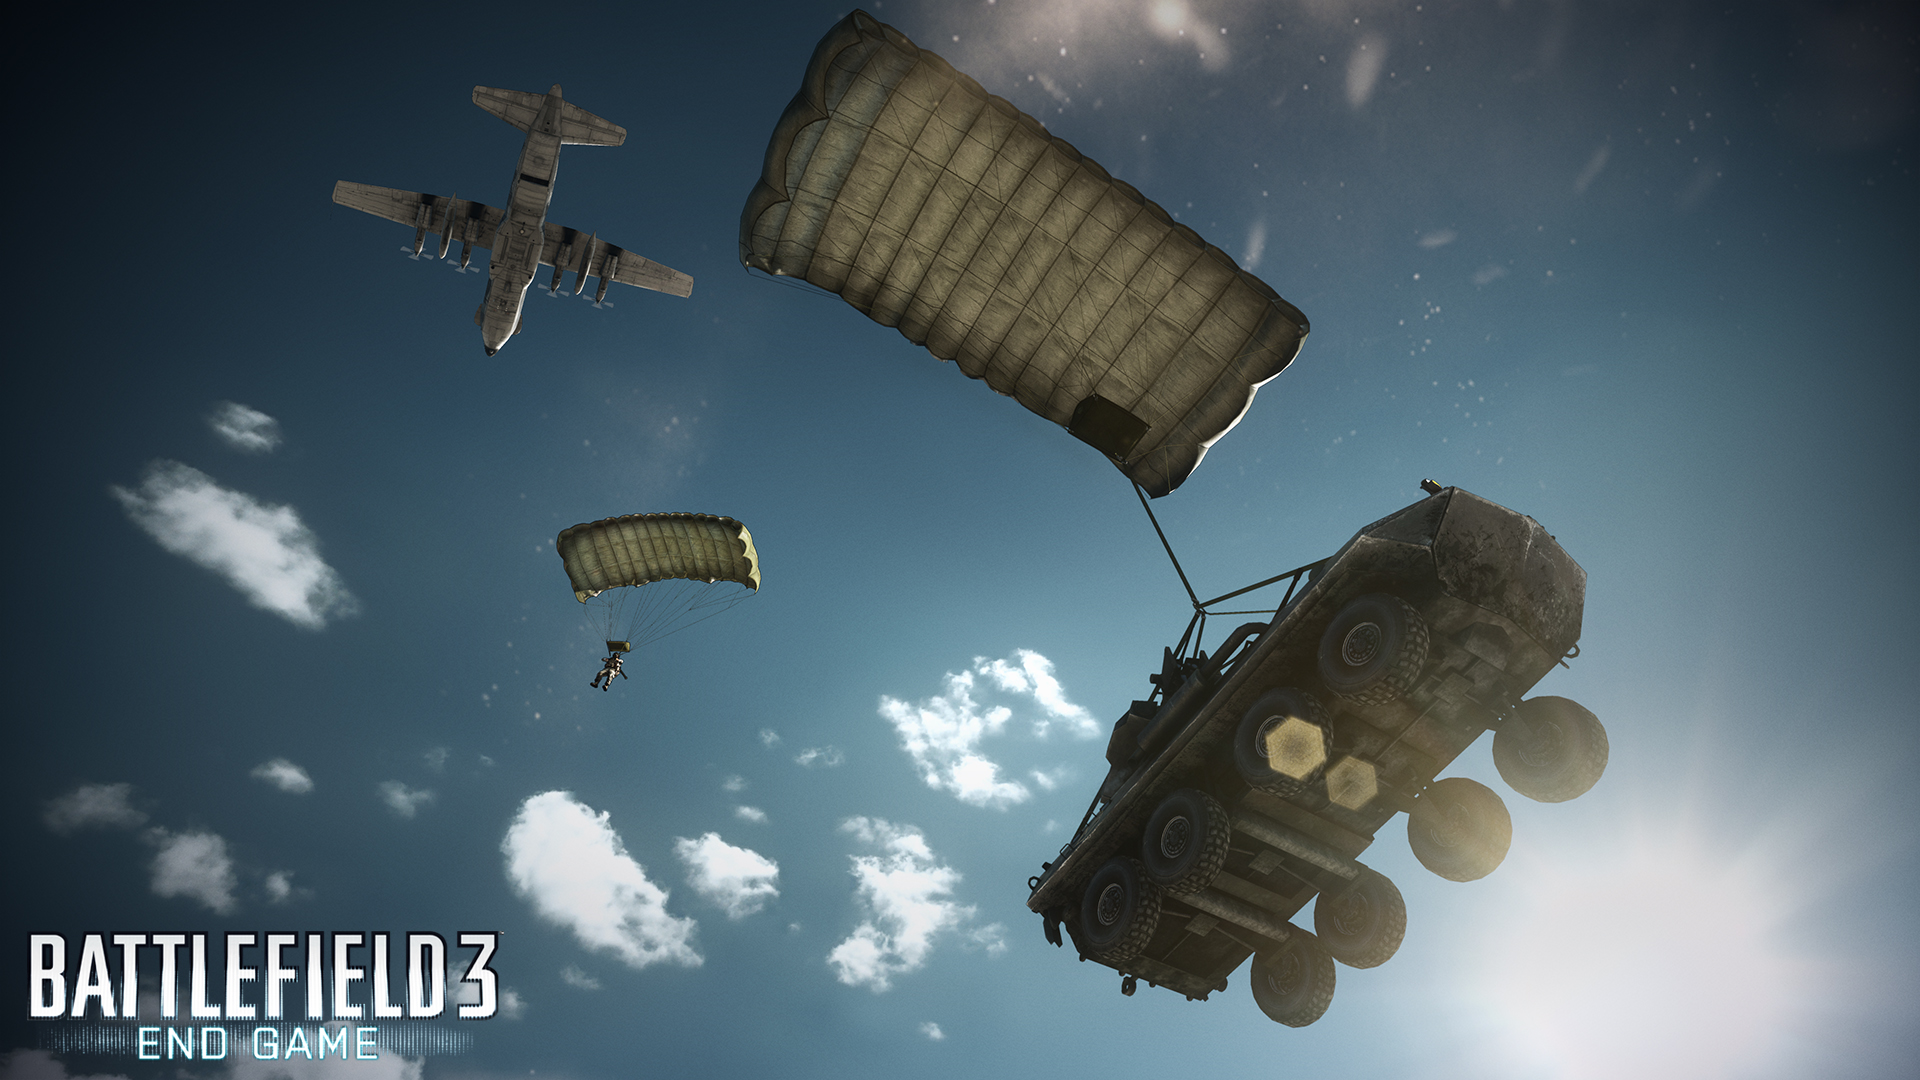 Image bf3 end game airdrop waterg battlefield wiki fandom image bf3 end game airdrop waterg battlefield wiki fandom powered by wikia ccuart Images